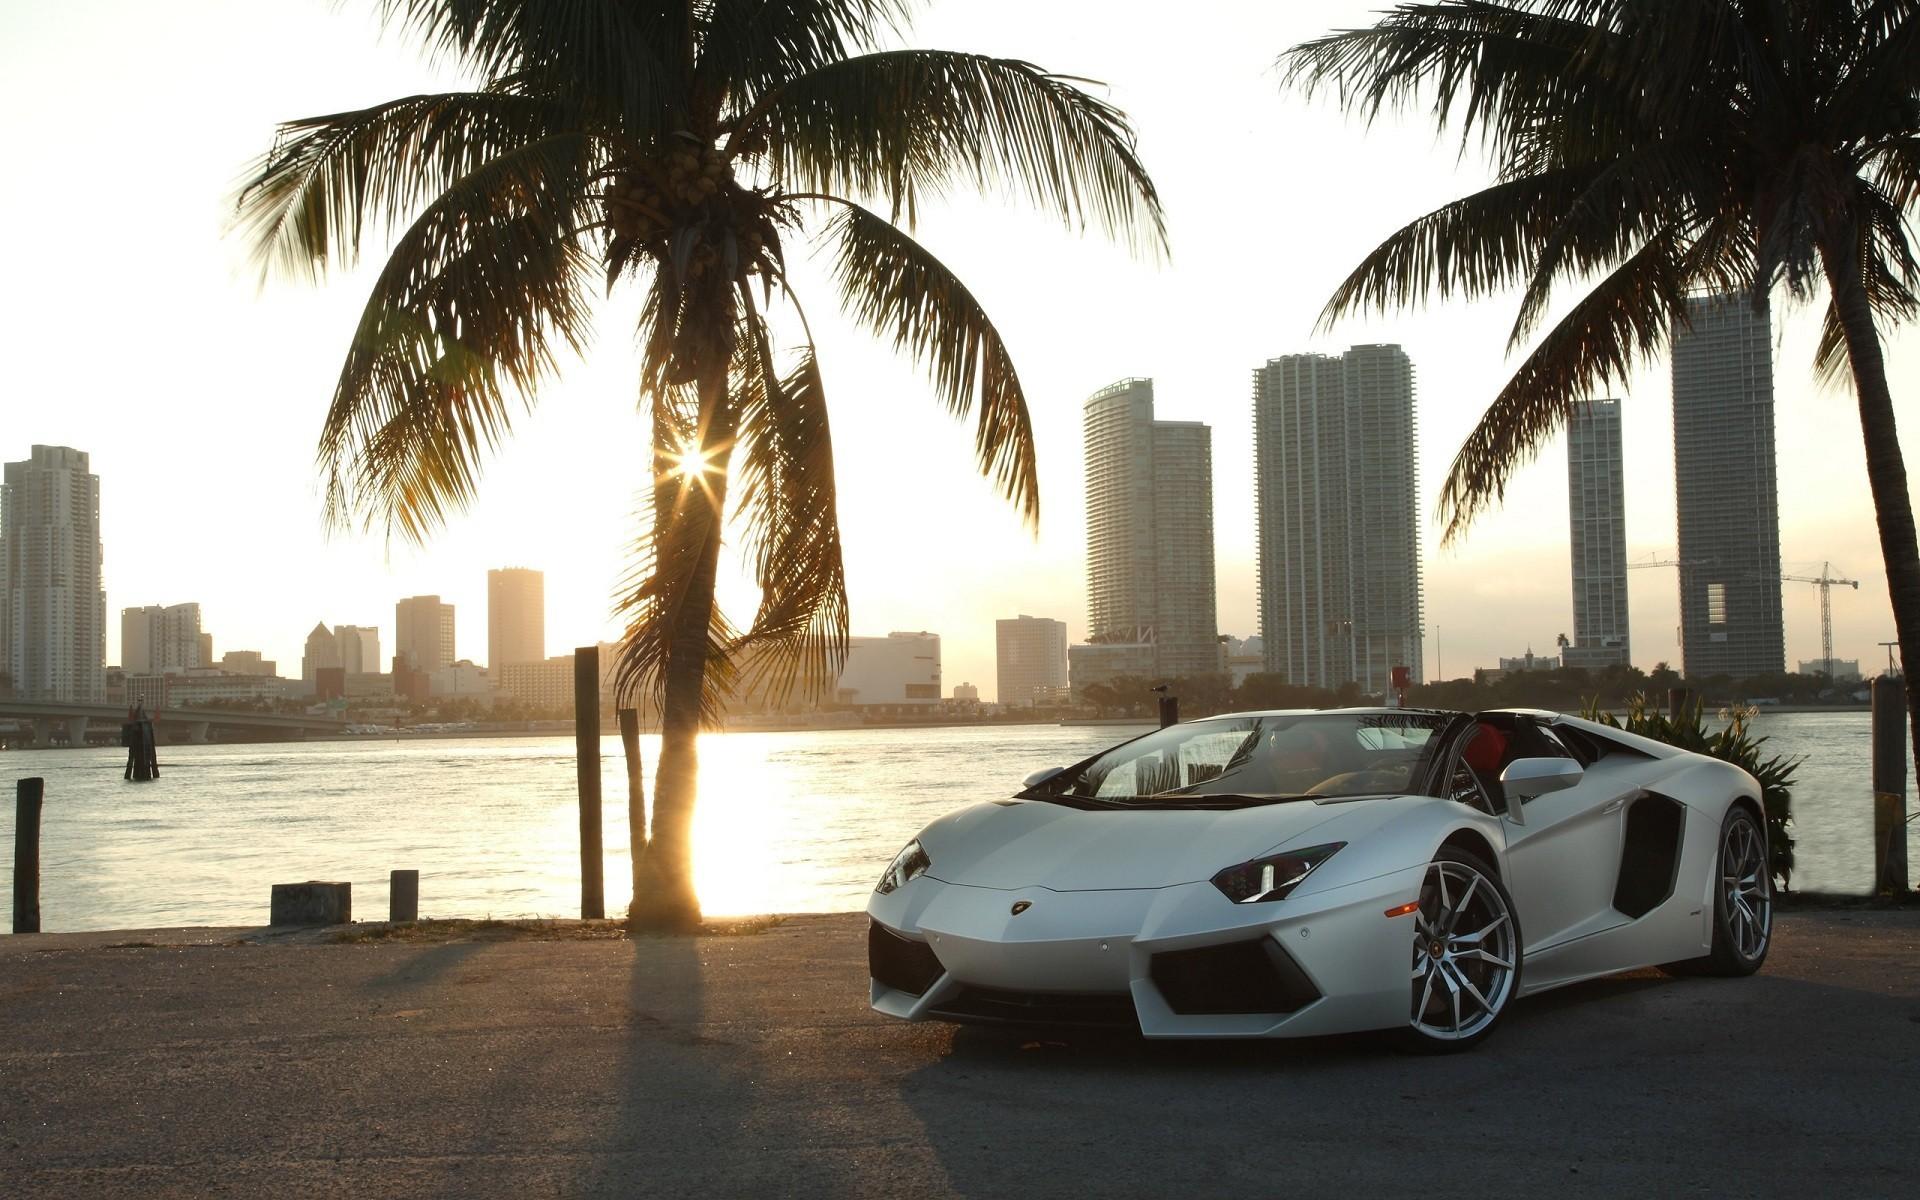 Lamborghini, Lamborghini Aventador LP700 4 Roadster, Lamborghini Aventador, Miami  Wallpapers HD / Desktop and Mobile Backgrounds